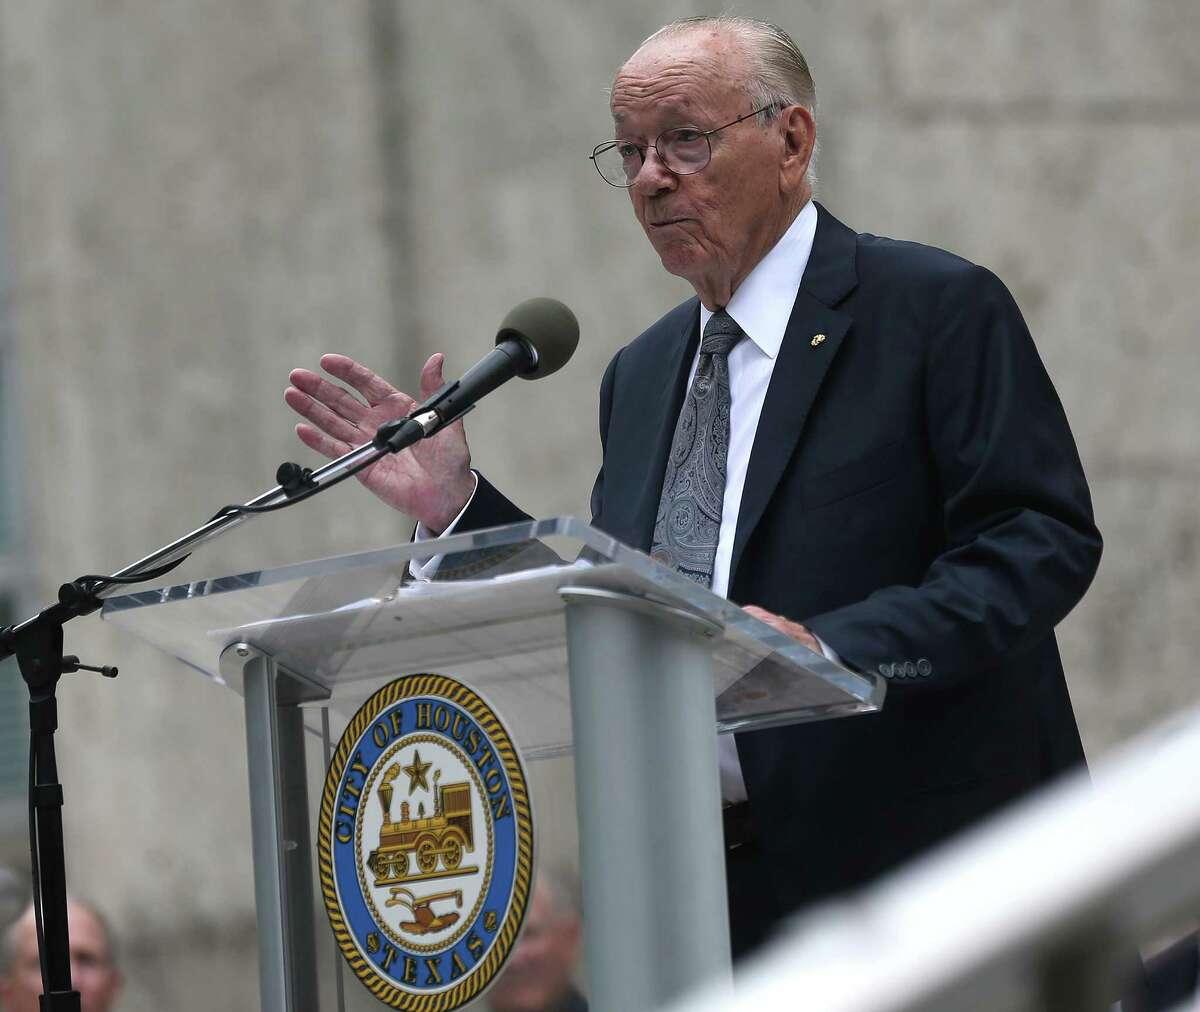 WWII veteran Bill Sherrill gives the keynote speech during Houston's Veteran's Day event downtown. Photos of Houston's Veteran's Day Parade on Wednesday, Nov. 11, 2015, in Houston.